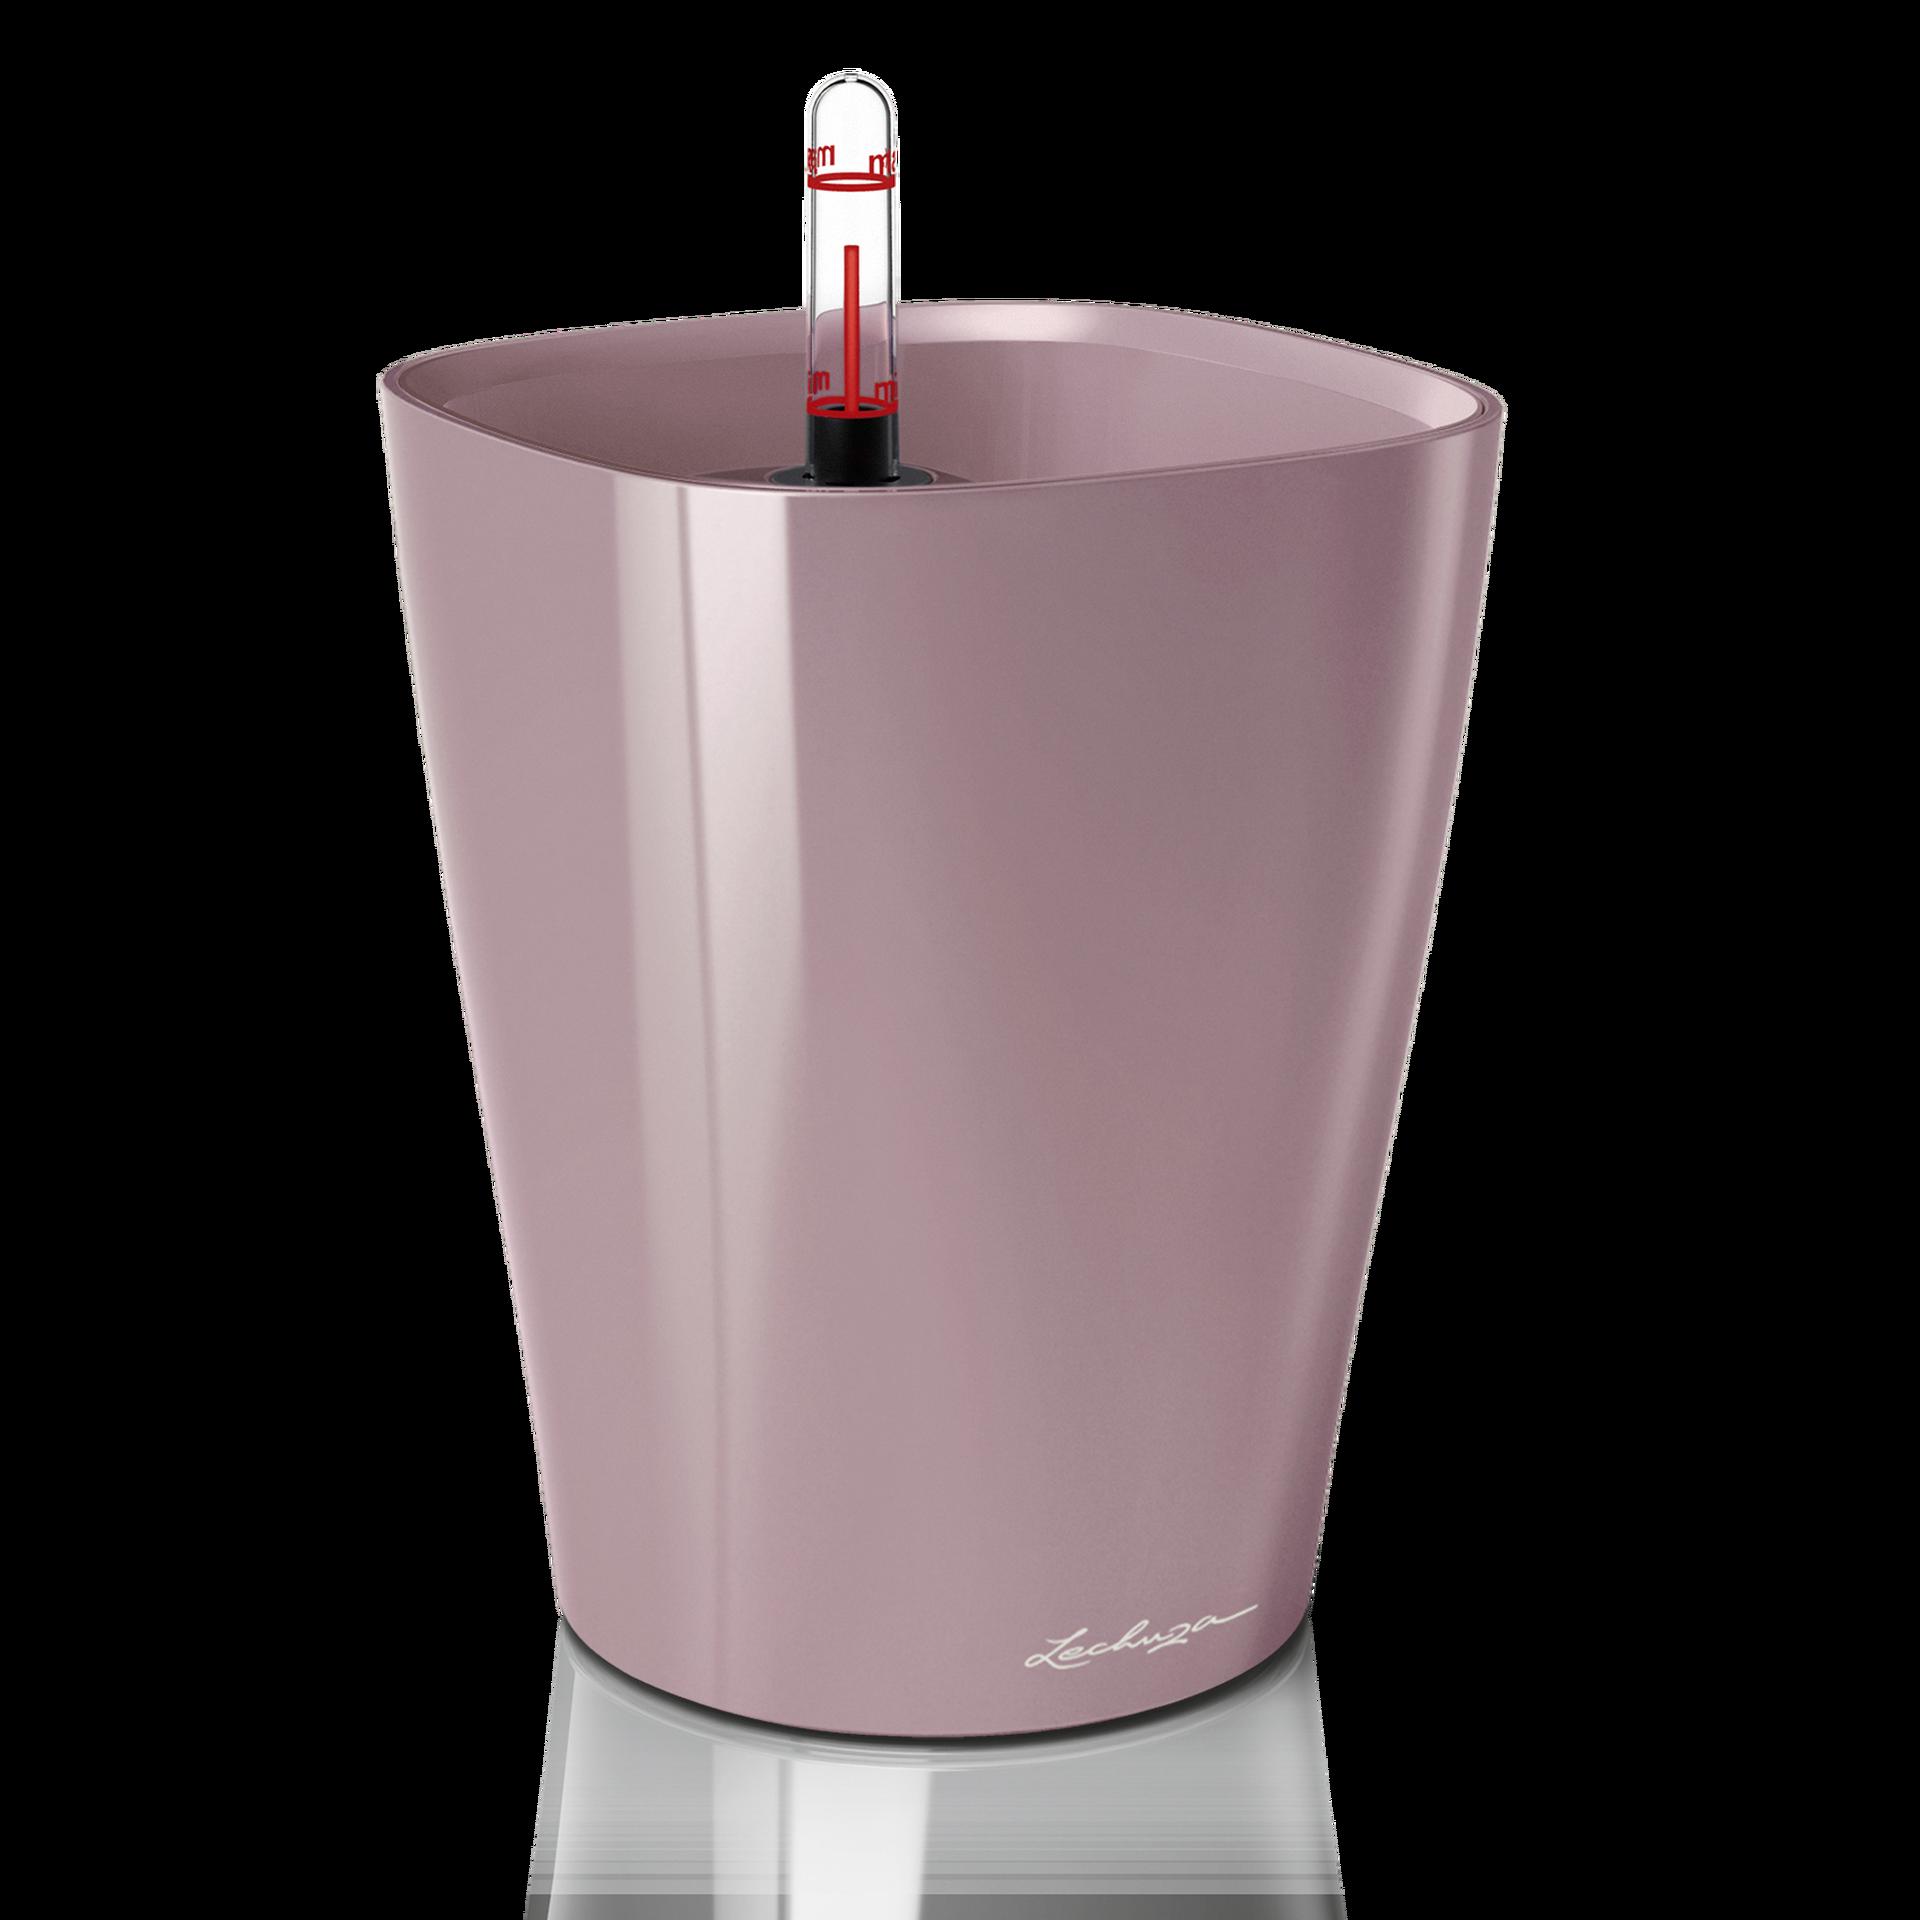 DELTINI pastel violet high-gloss